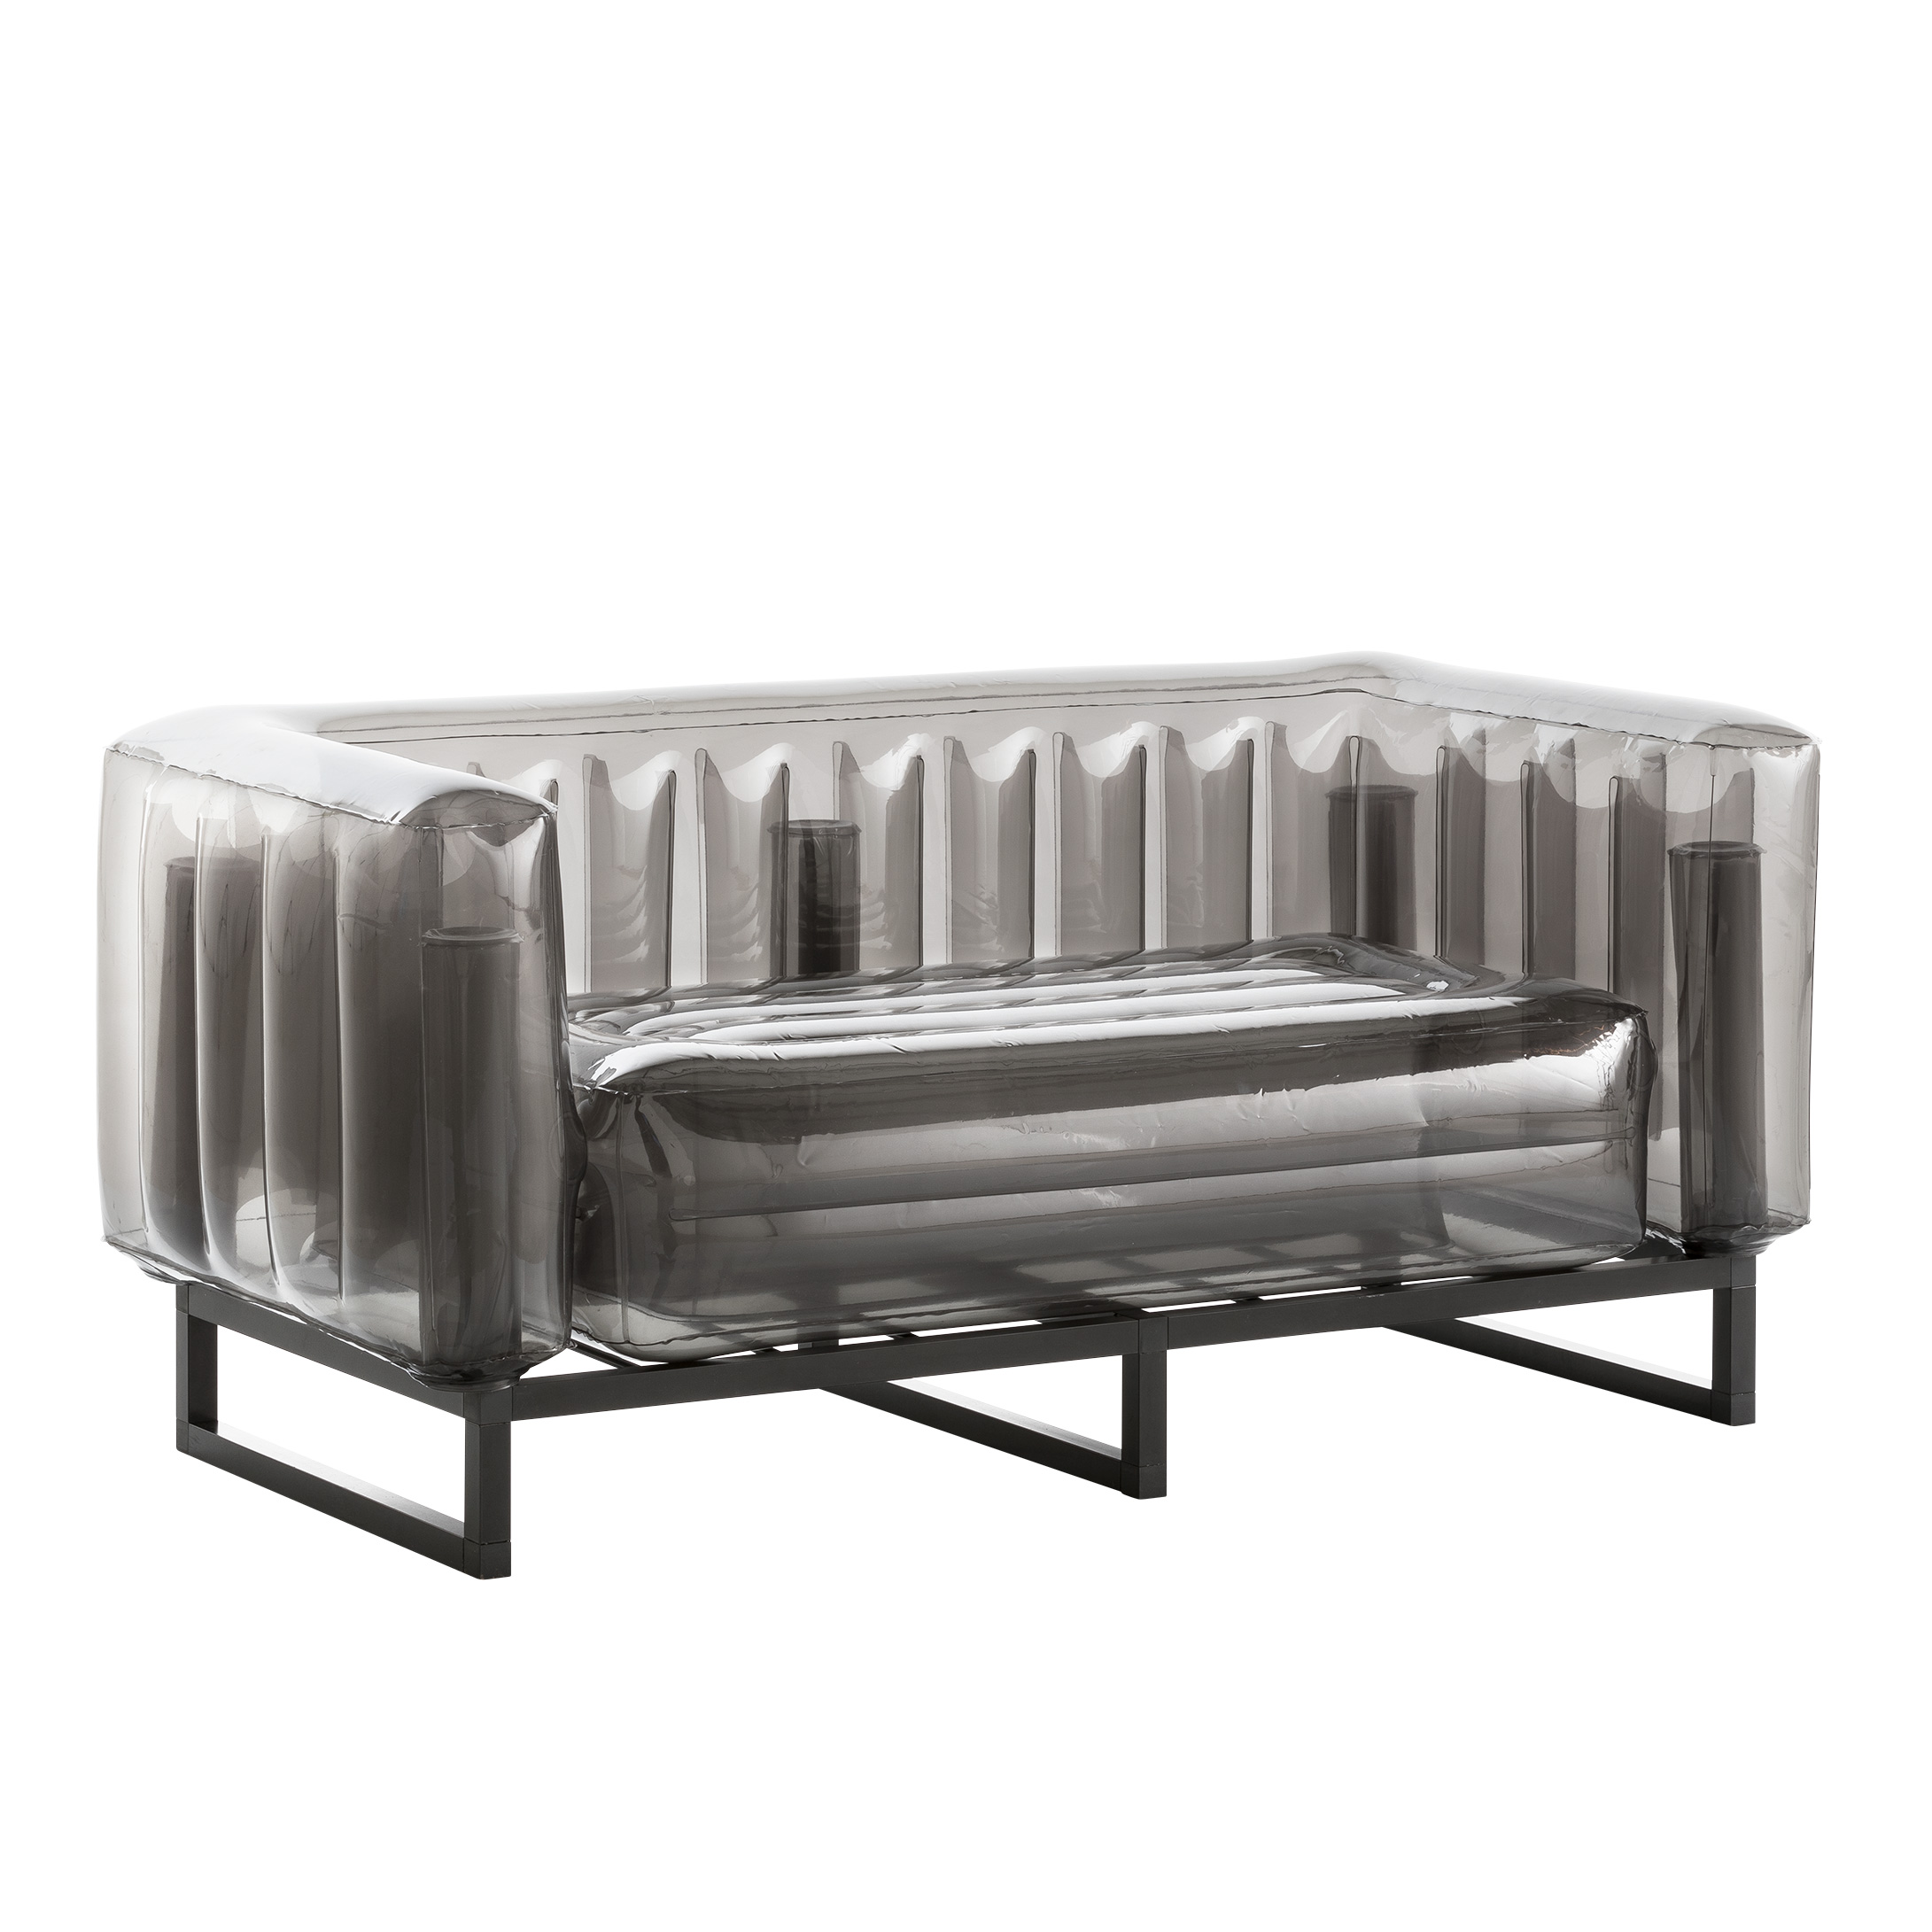 Canapé cadre aluminium assise thermoplastique noir crystal